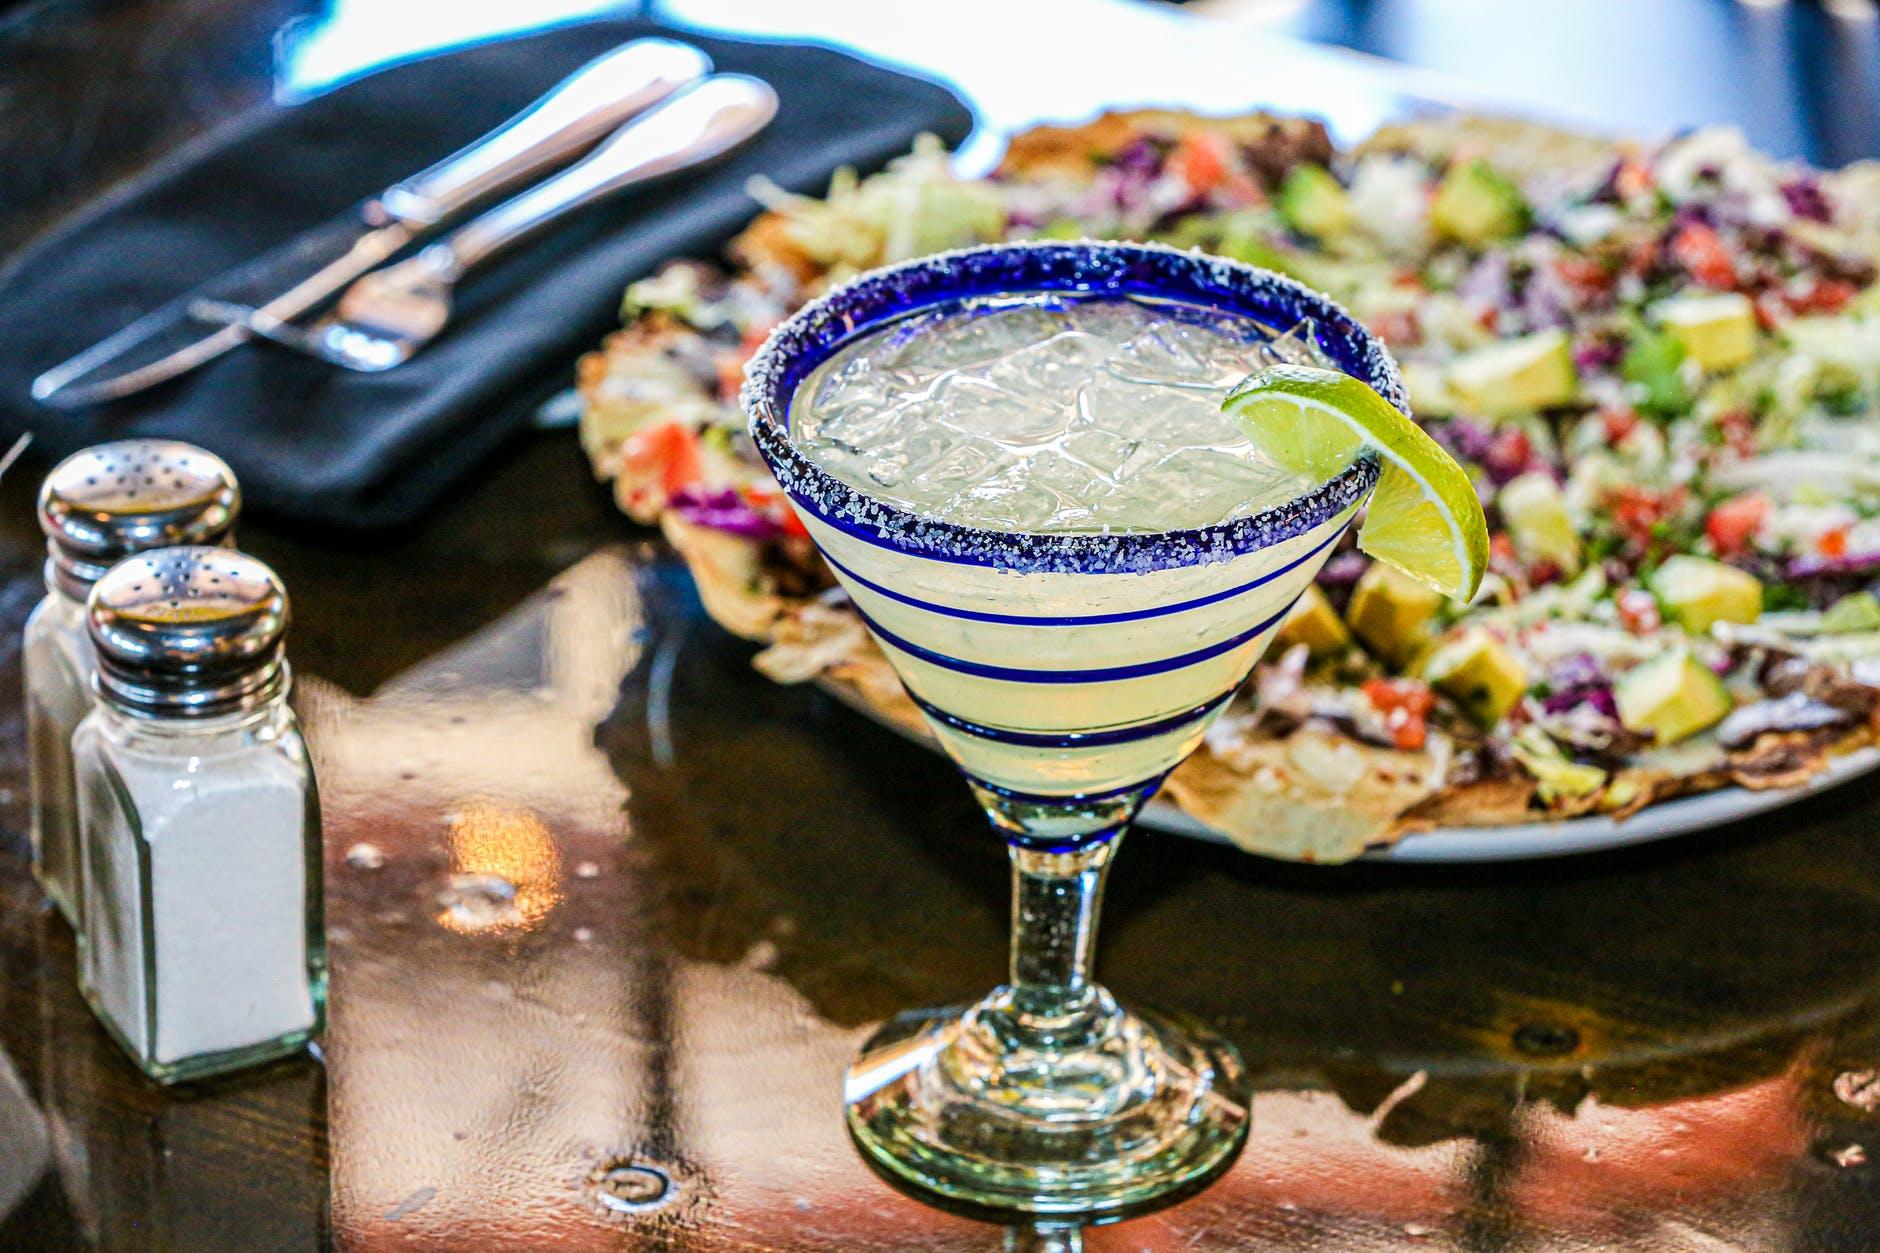 margarita glass on table